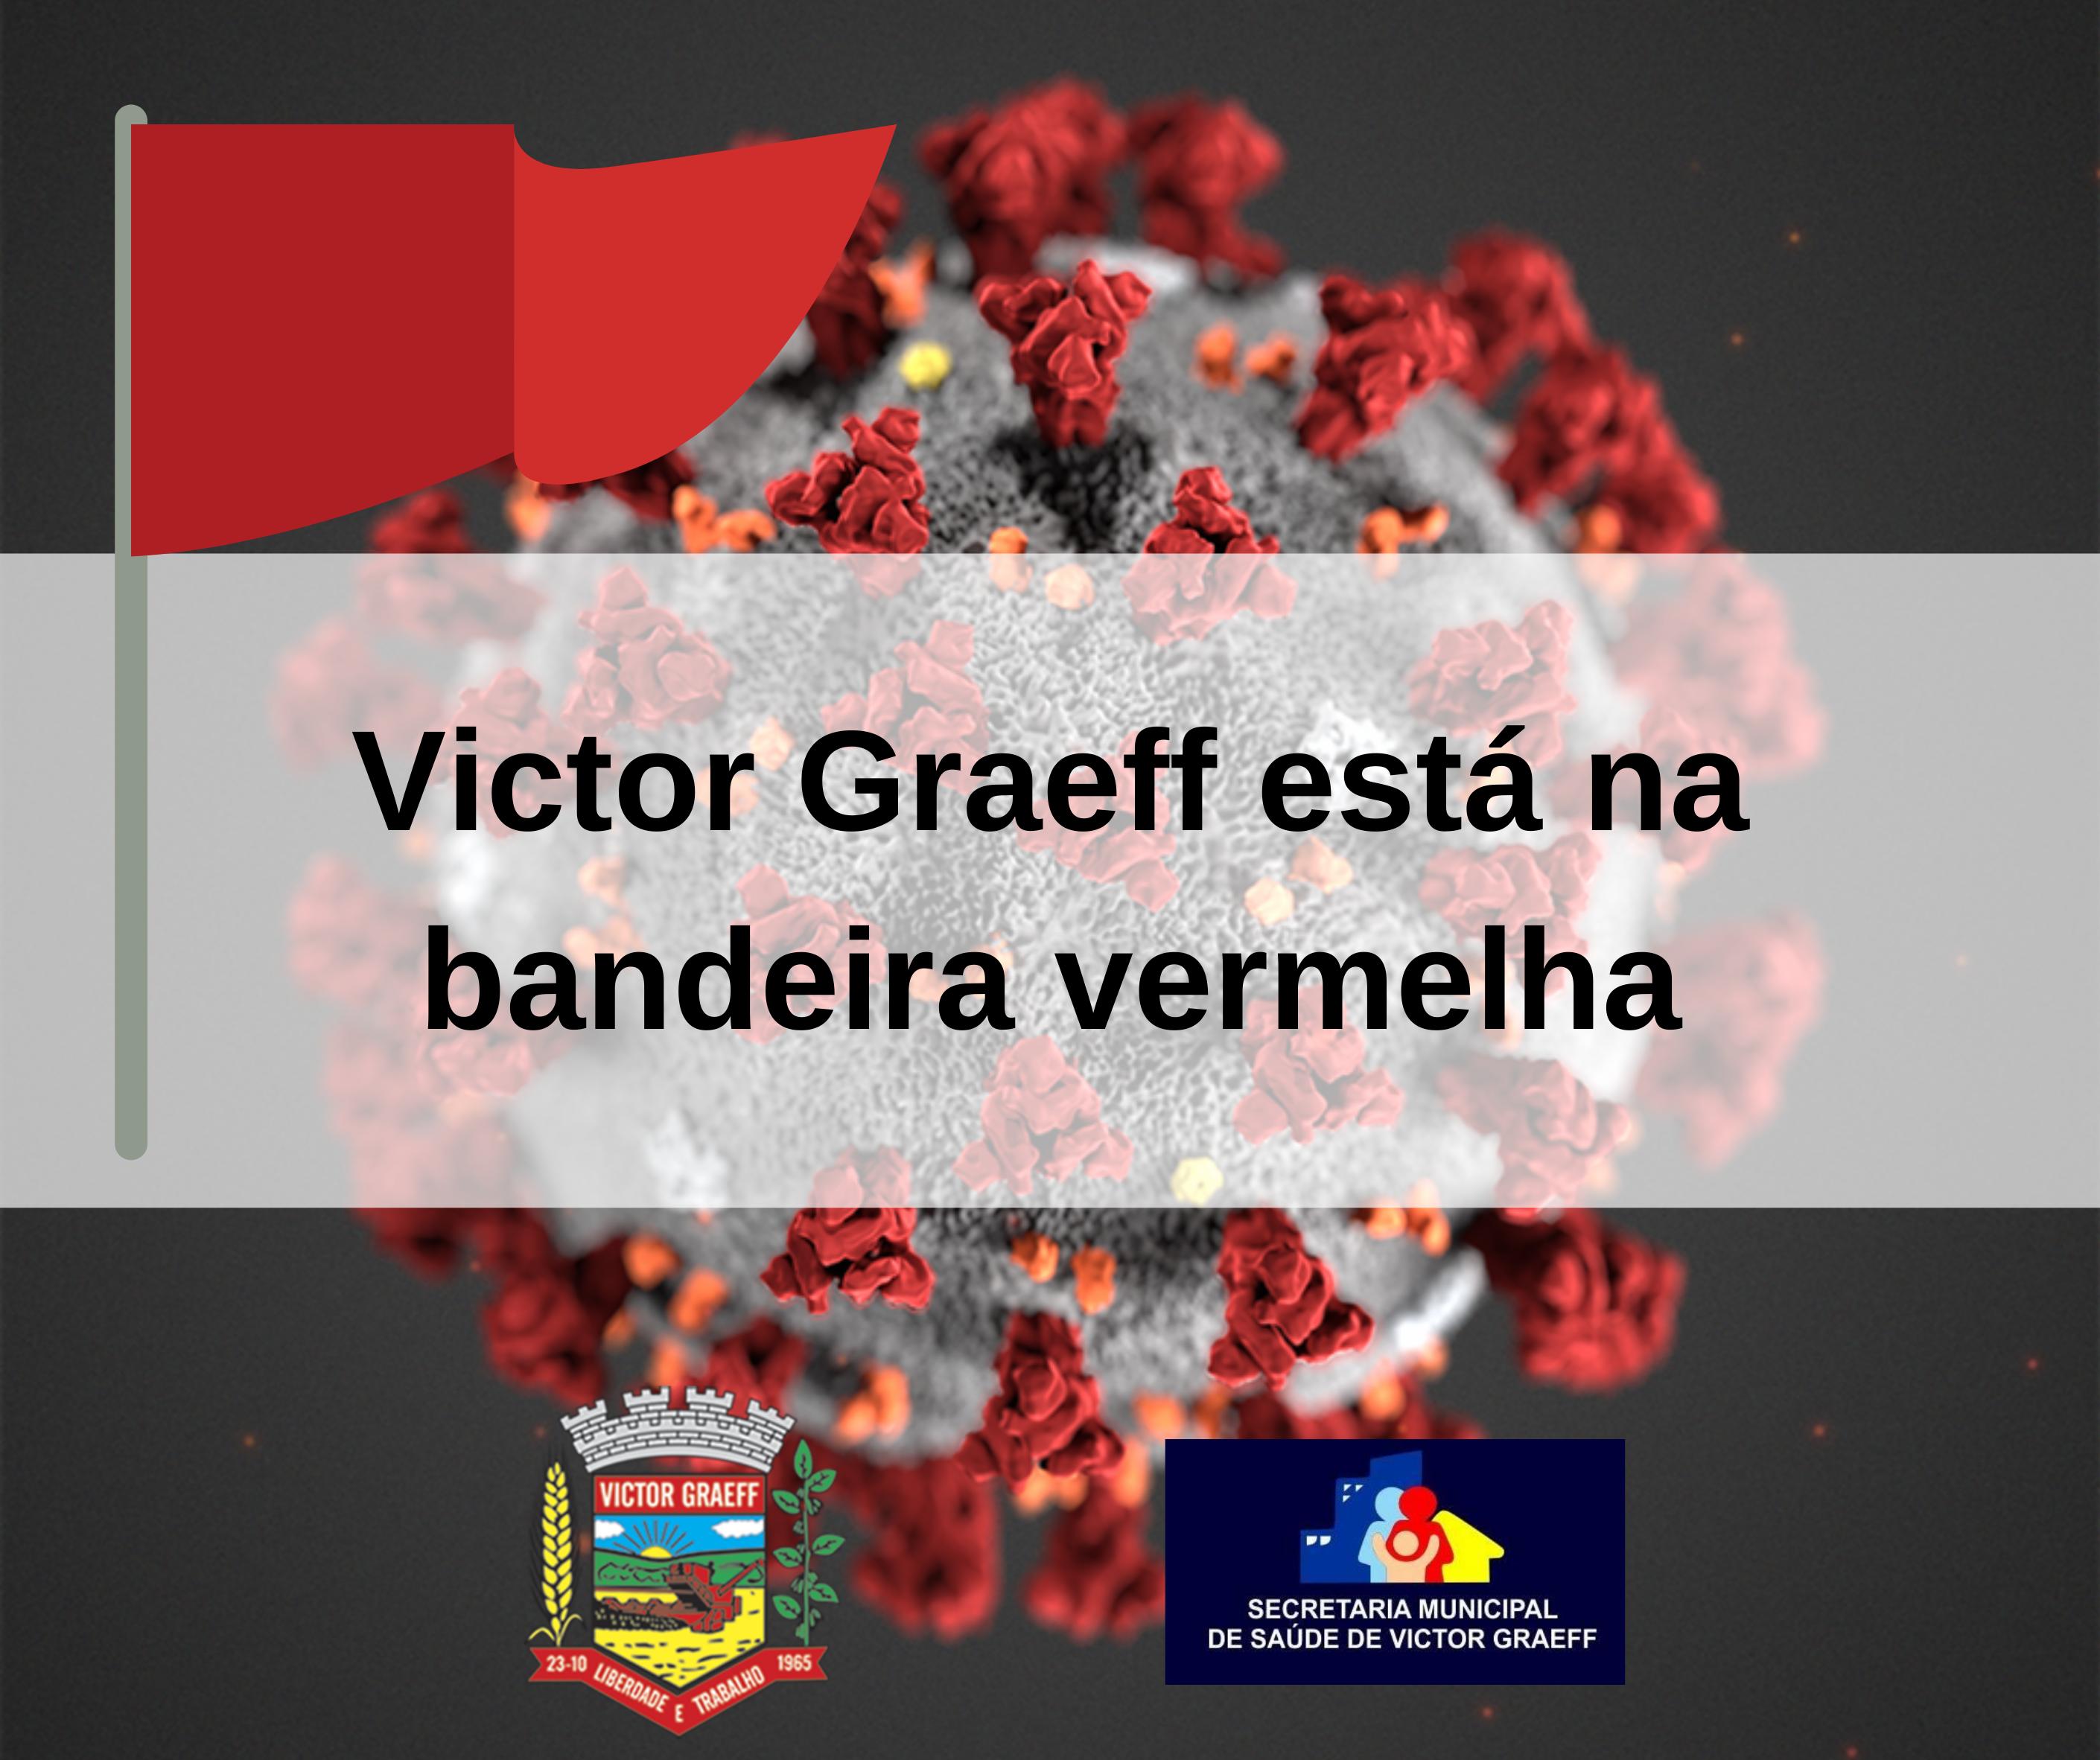 Victor Graeff está na bandeira vermelha